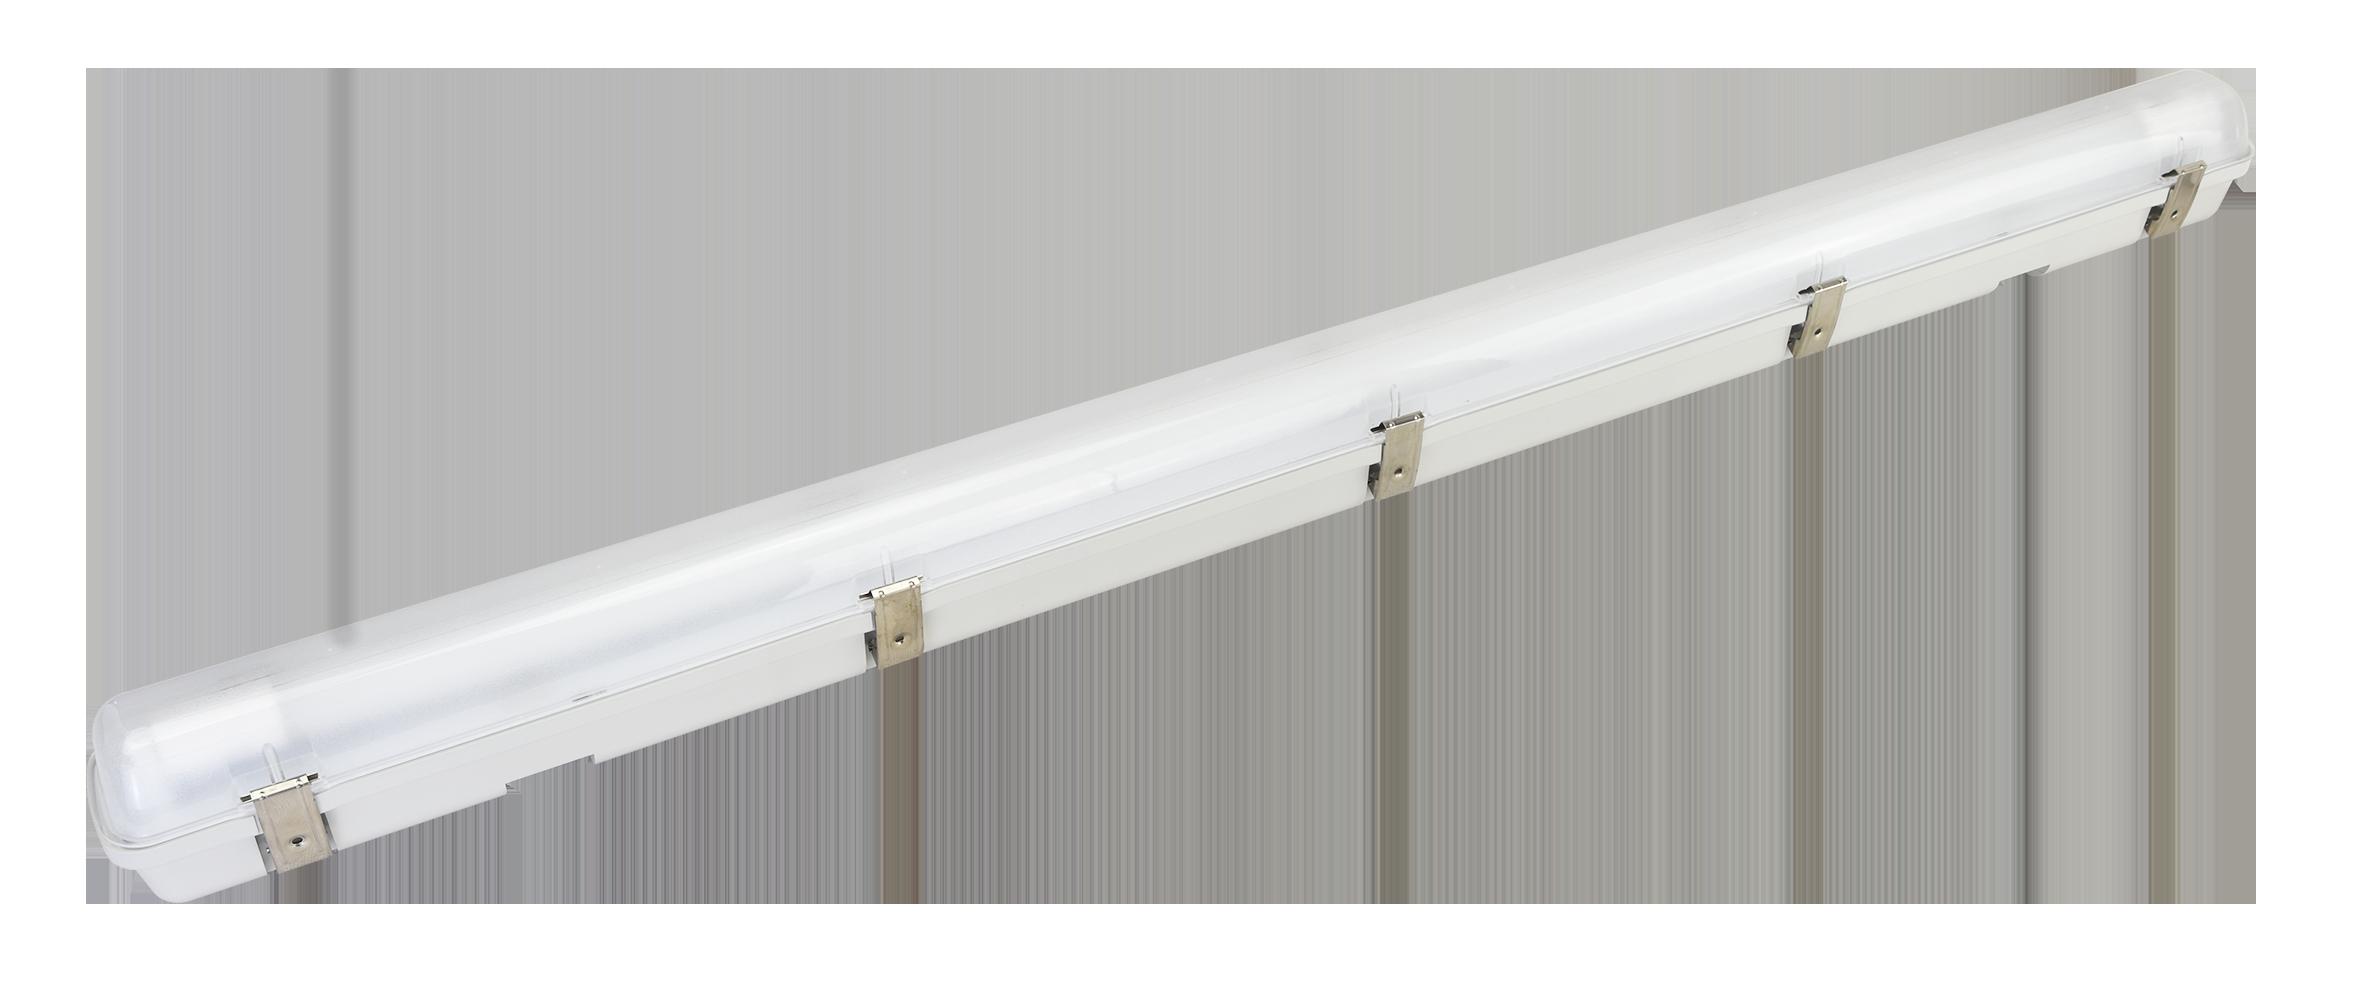 Tempest Nova Batten with LED Tubes (IP65, Vandalproof)